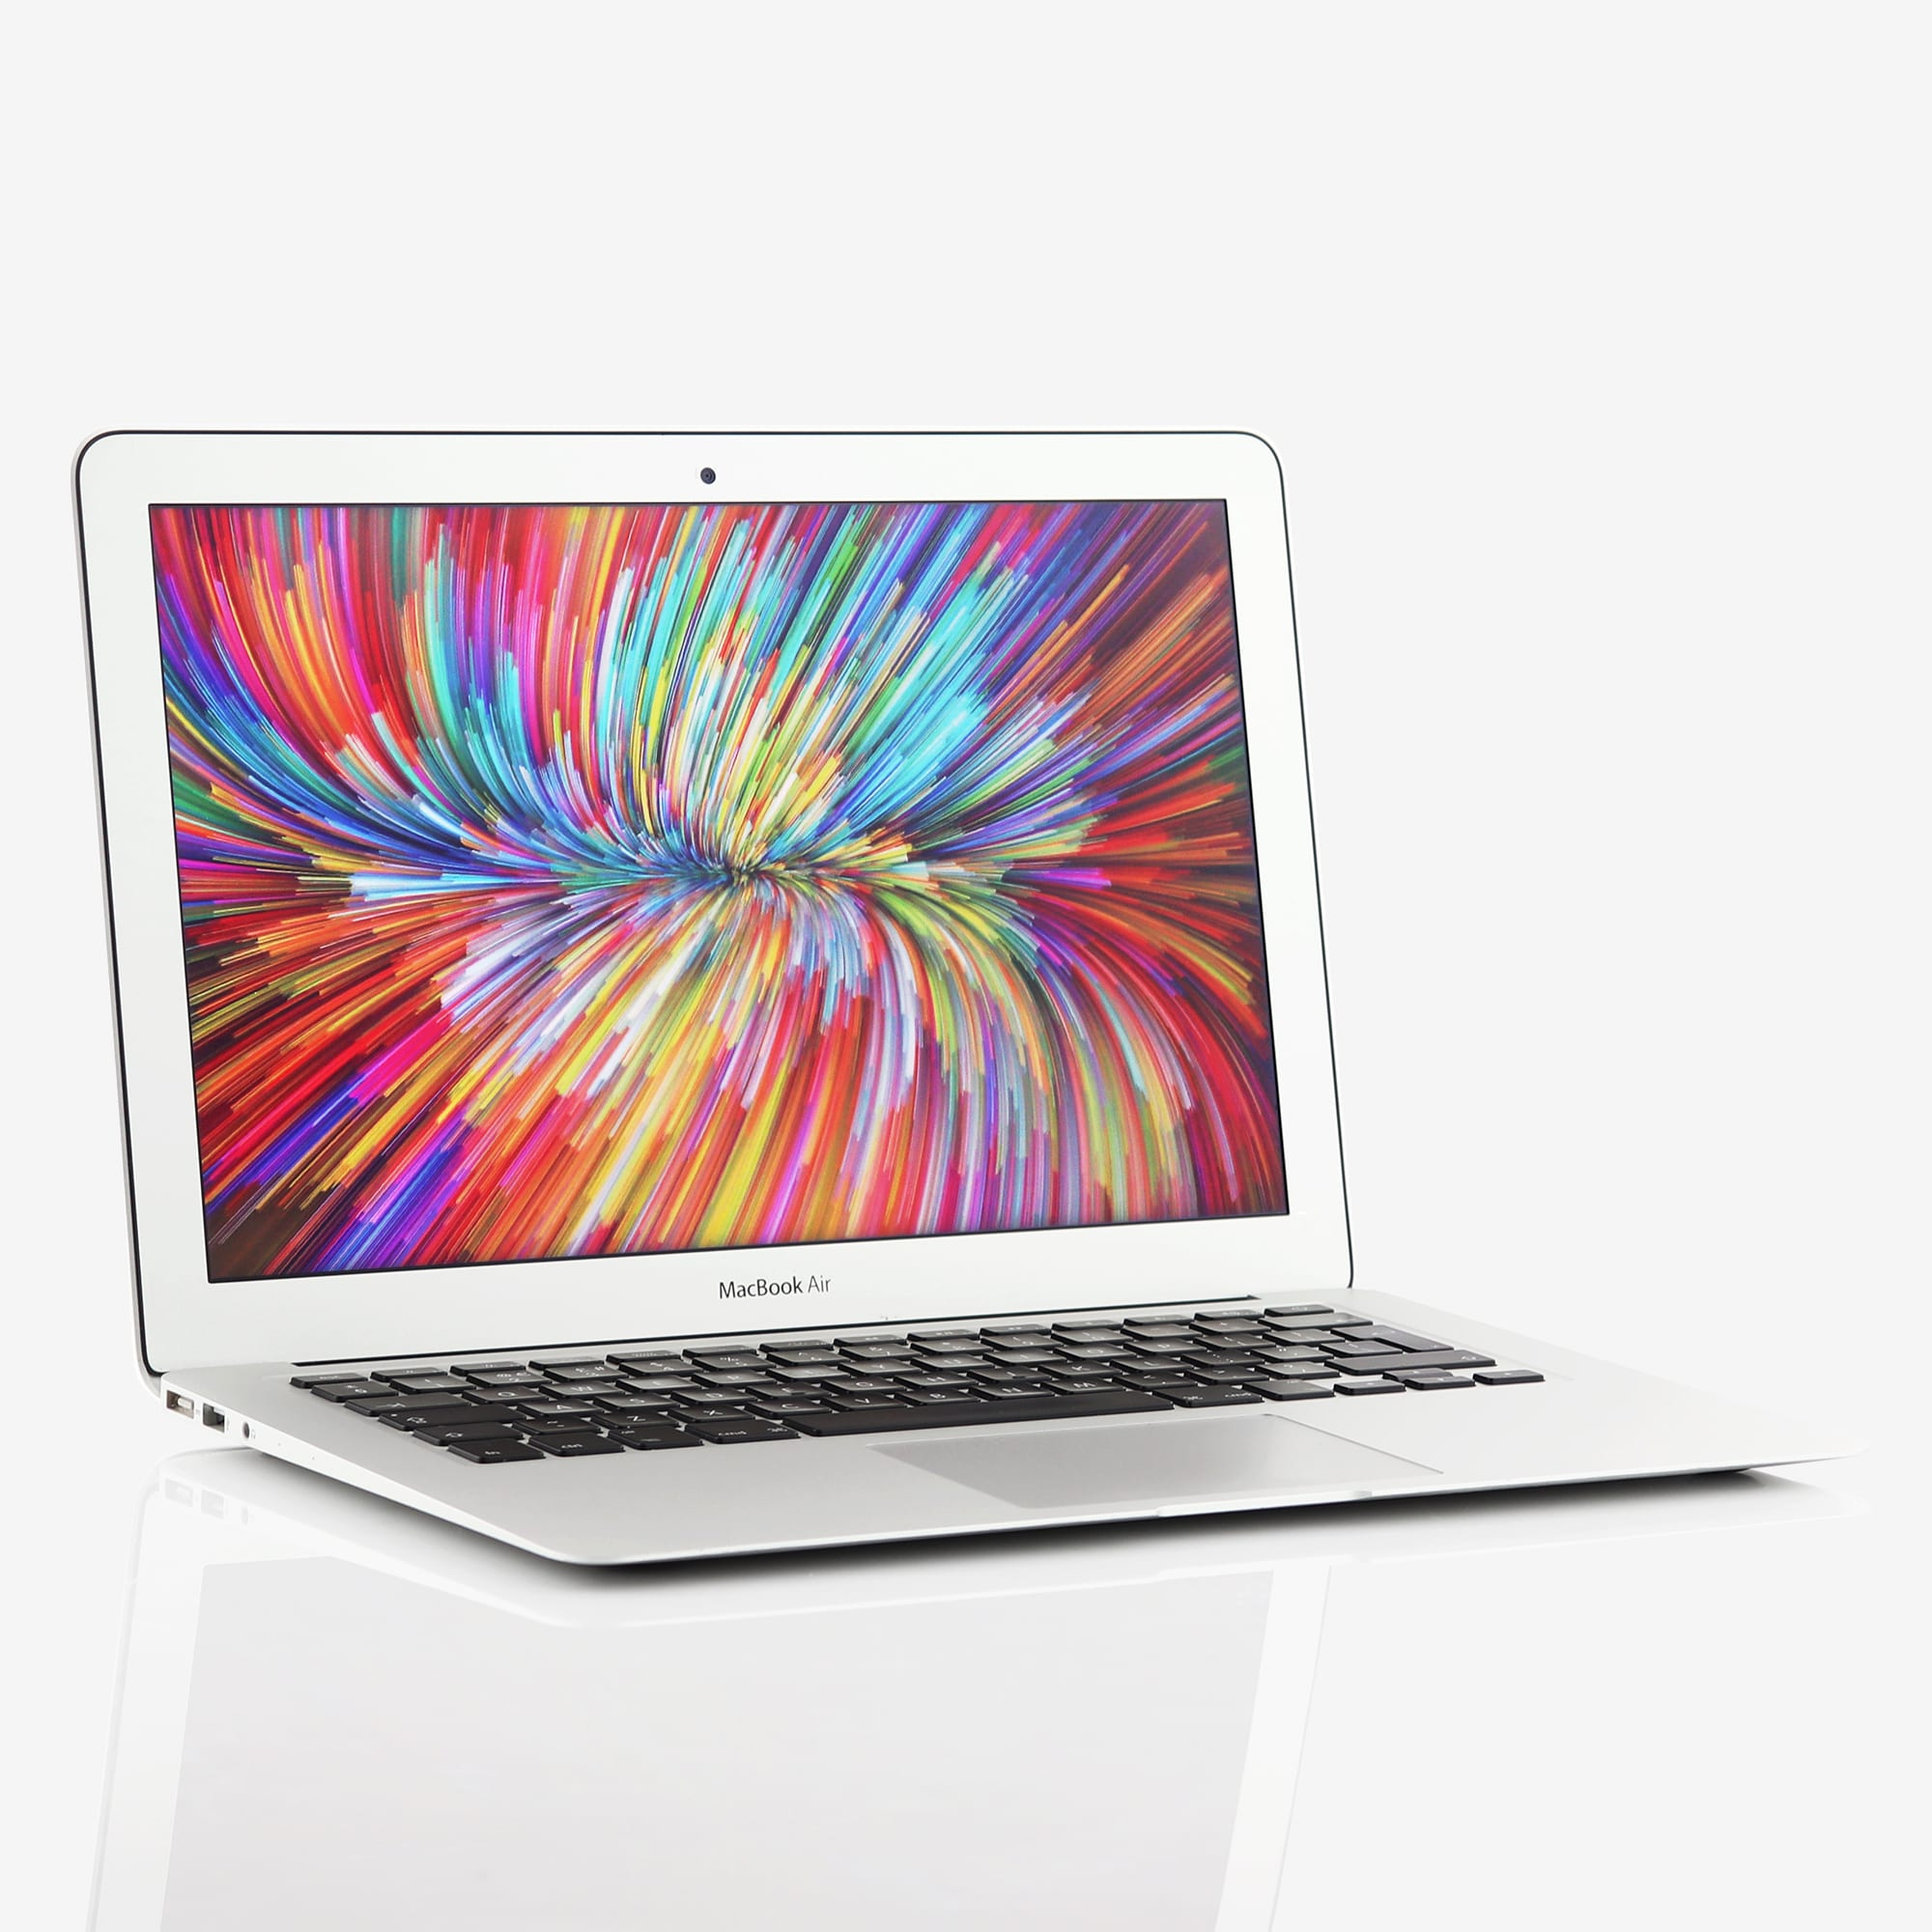 1 x Apple MacBook Air 13 Inch Dual-Core i5 1.70 GHz (2011)